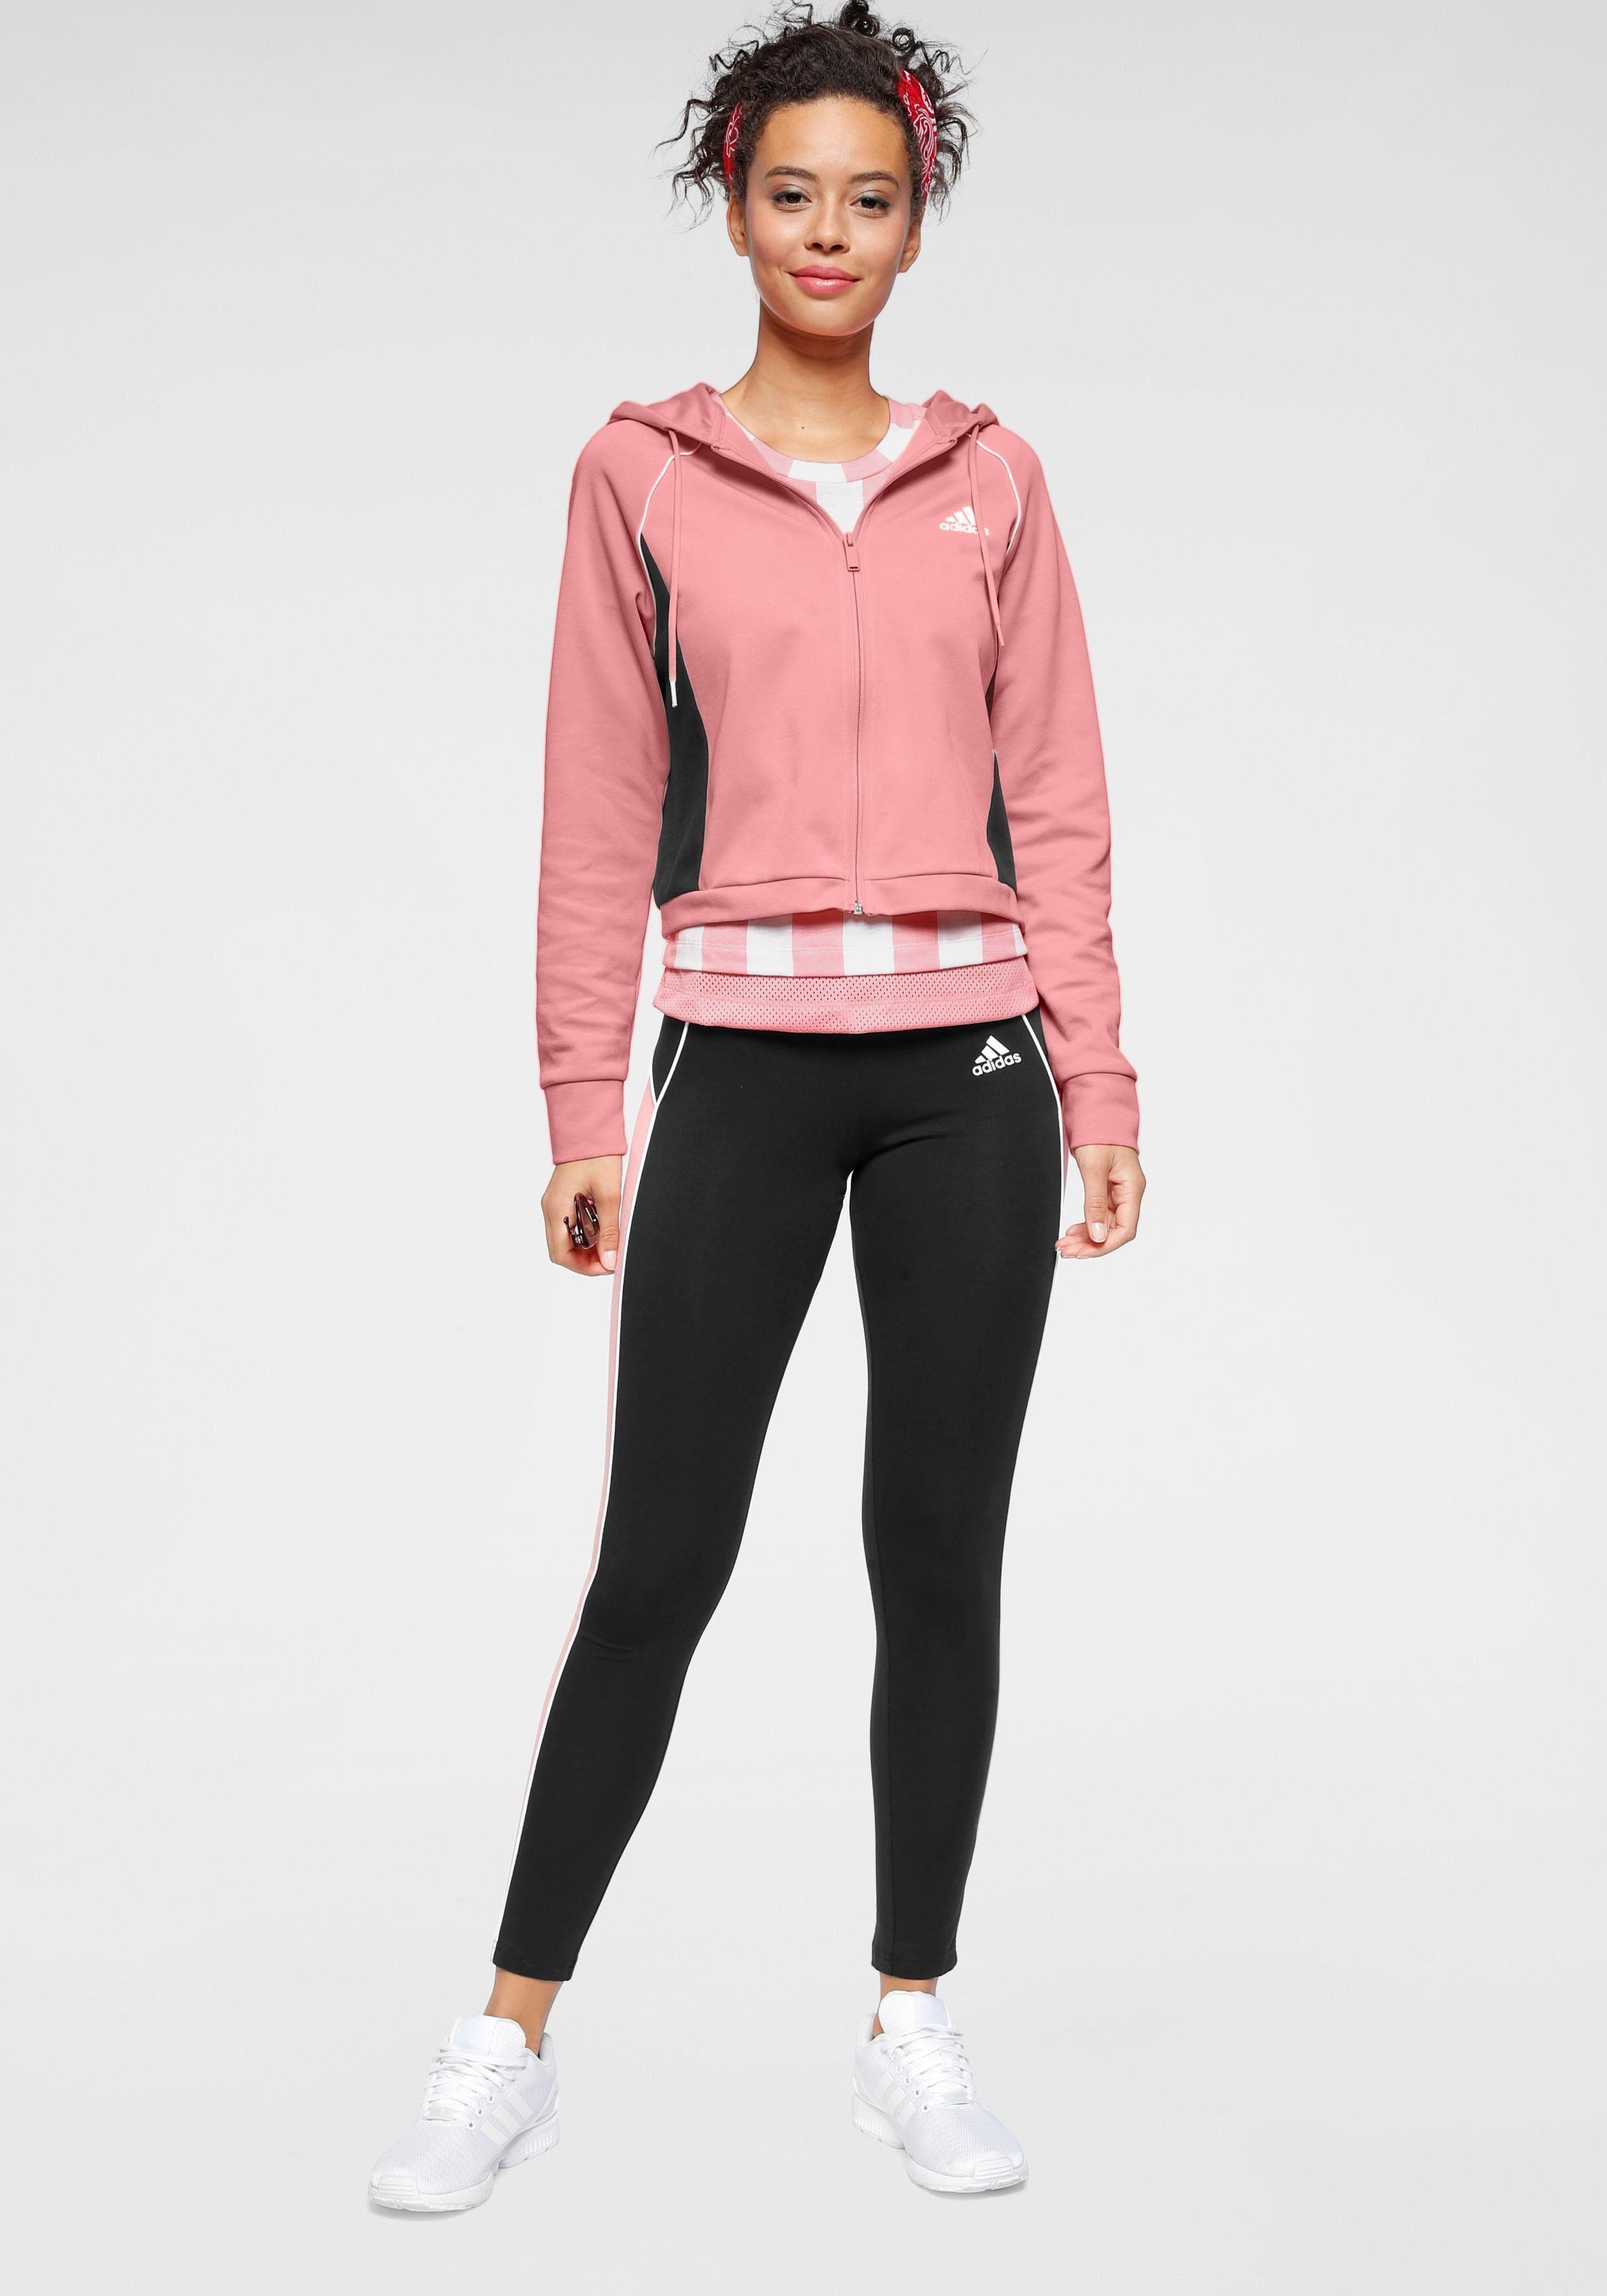 adidas Performance Jogginganzug TRACKSUIT HOODY & TIGHT   Sportbekleidung > Sportanzüge > Jogginganzüge   adidas performance